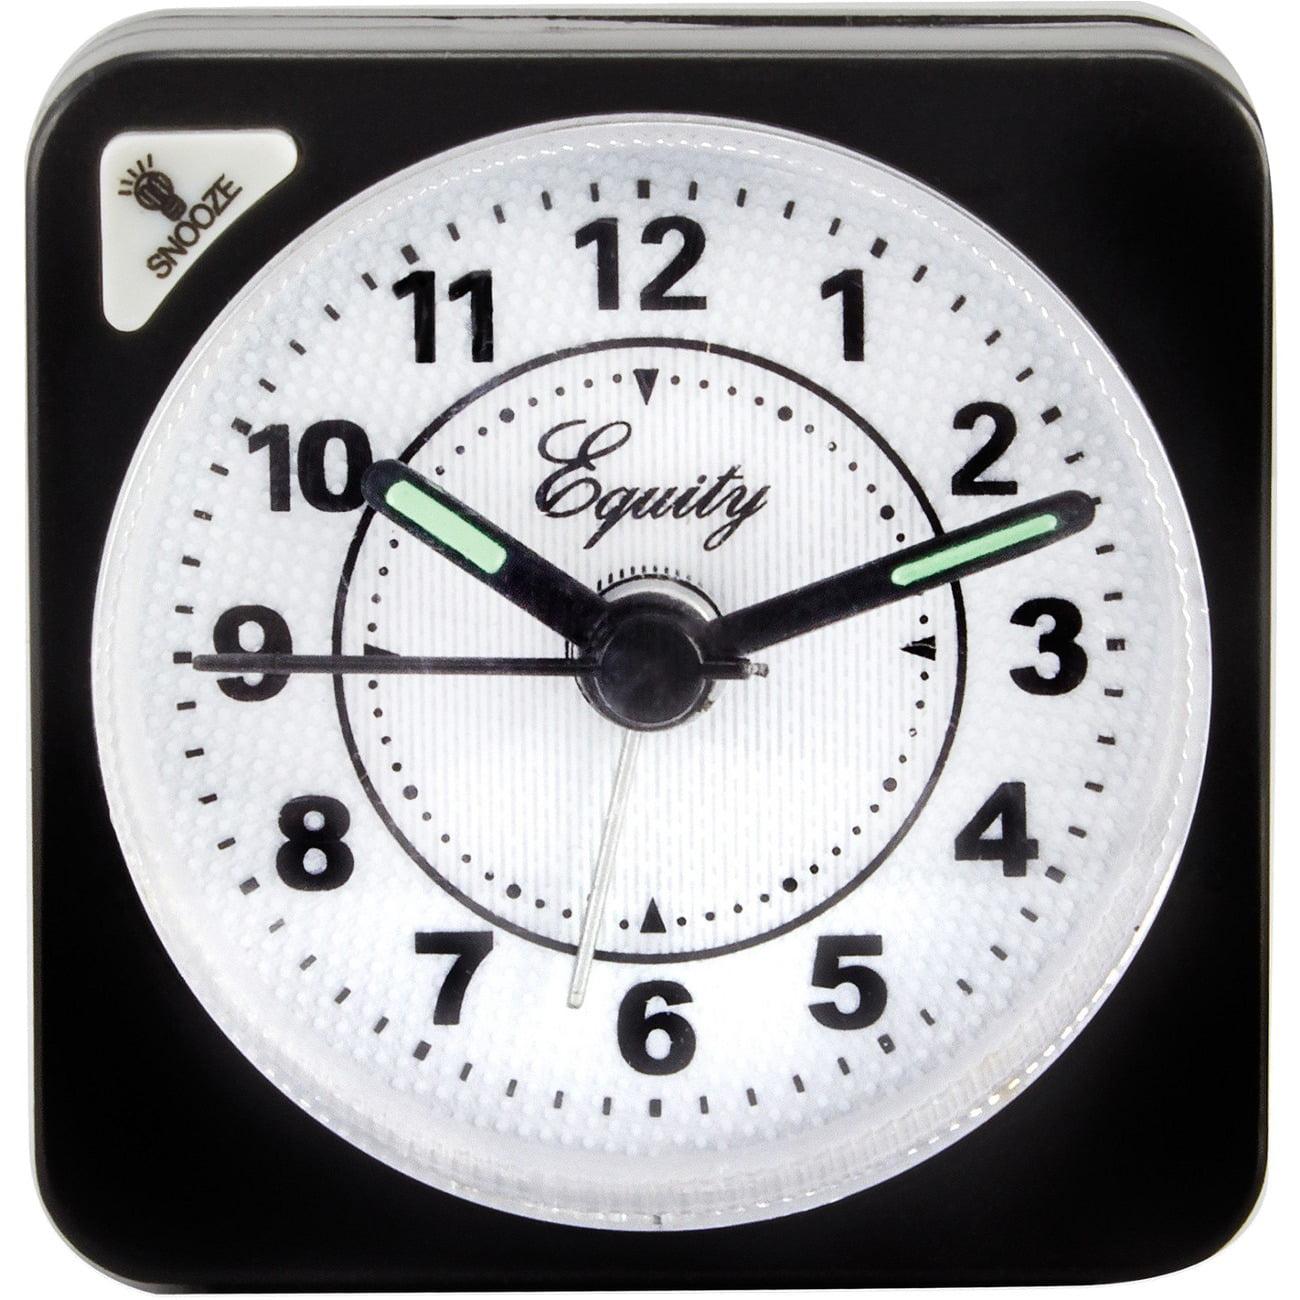 Equity by La Crosse 20078 Quartz Travel Alarm